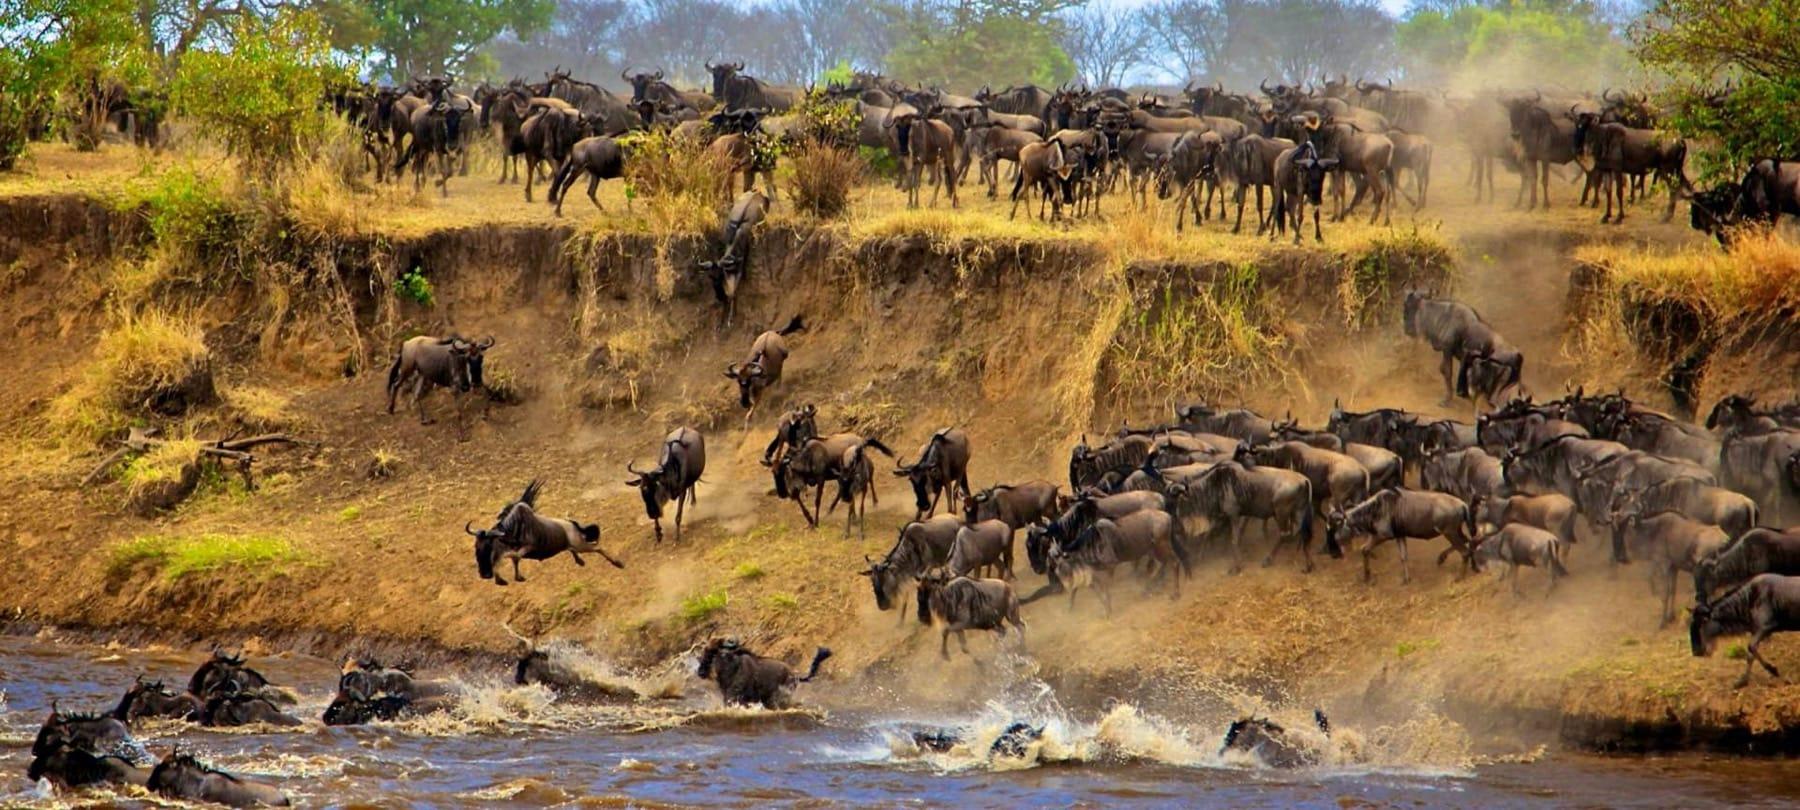 Great Migration_Masai Mara_Kenya